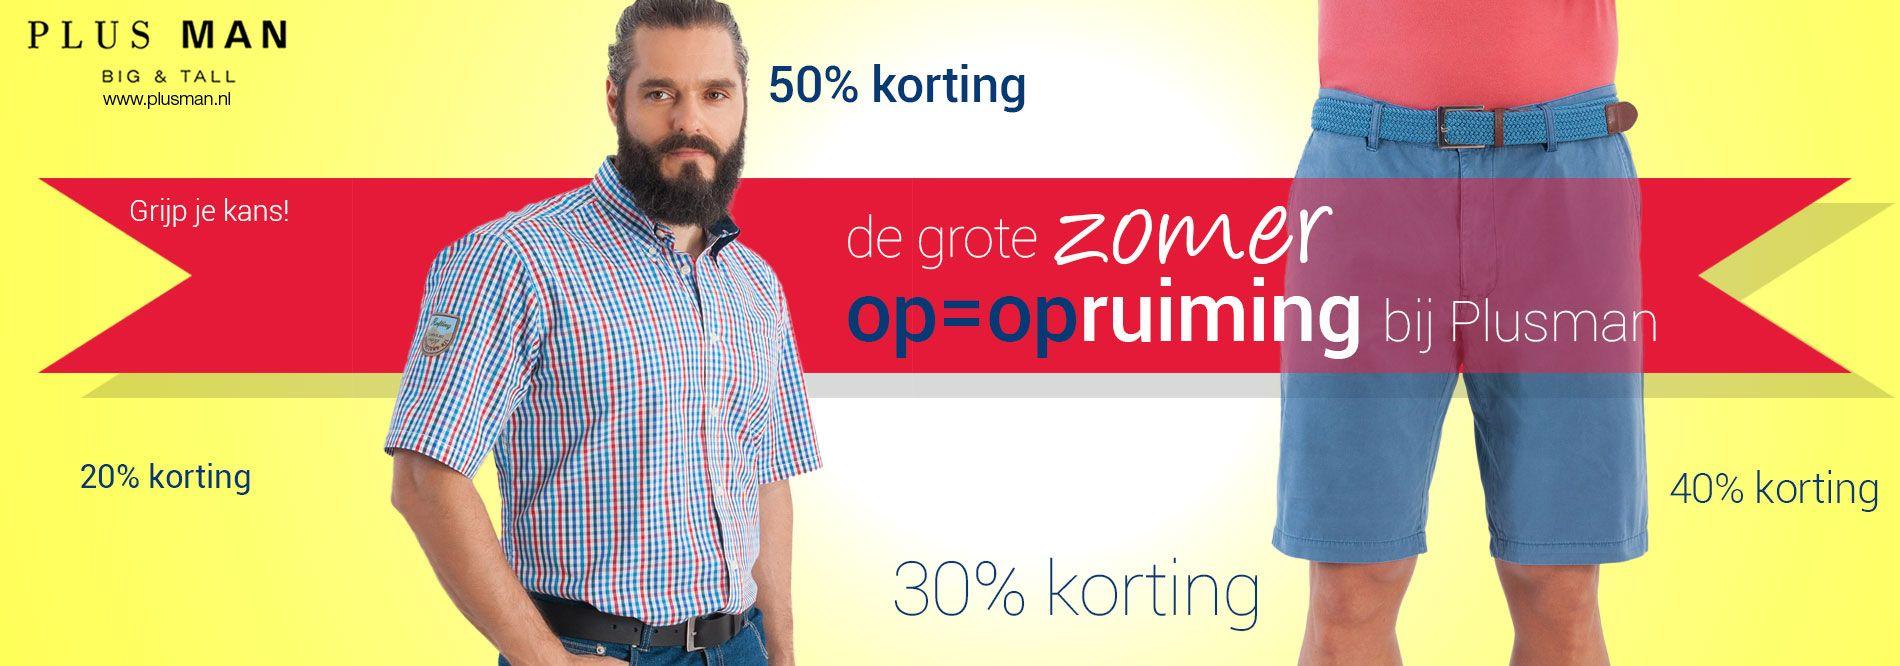 Sale bij plusman.nl, tot 50% korting